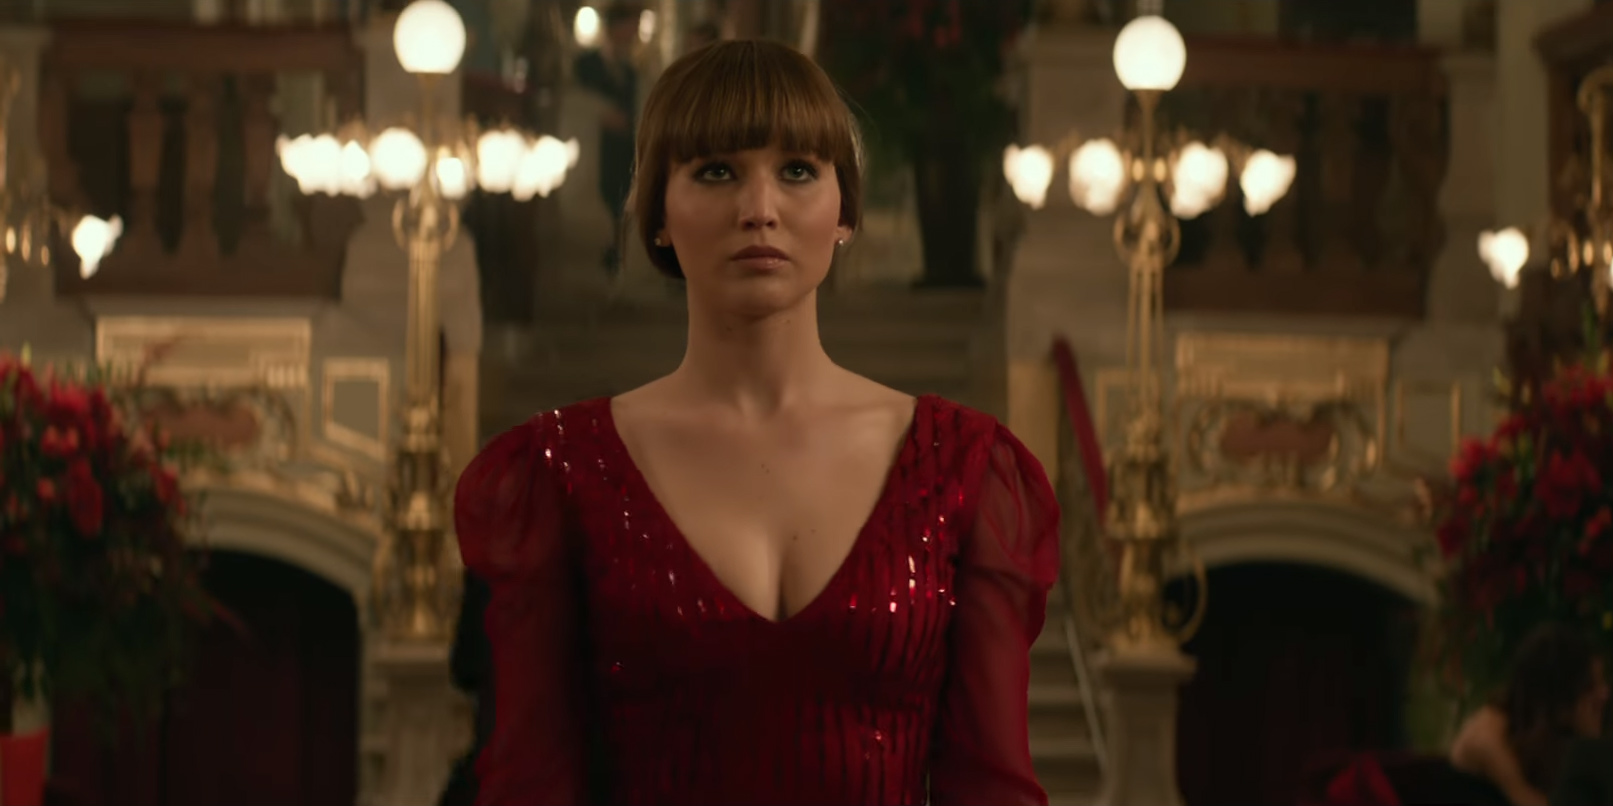 Jennifer Lawrence schittert als verleidelijke moordmachine in 'Red Sparrow'